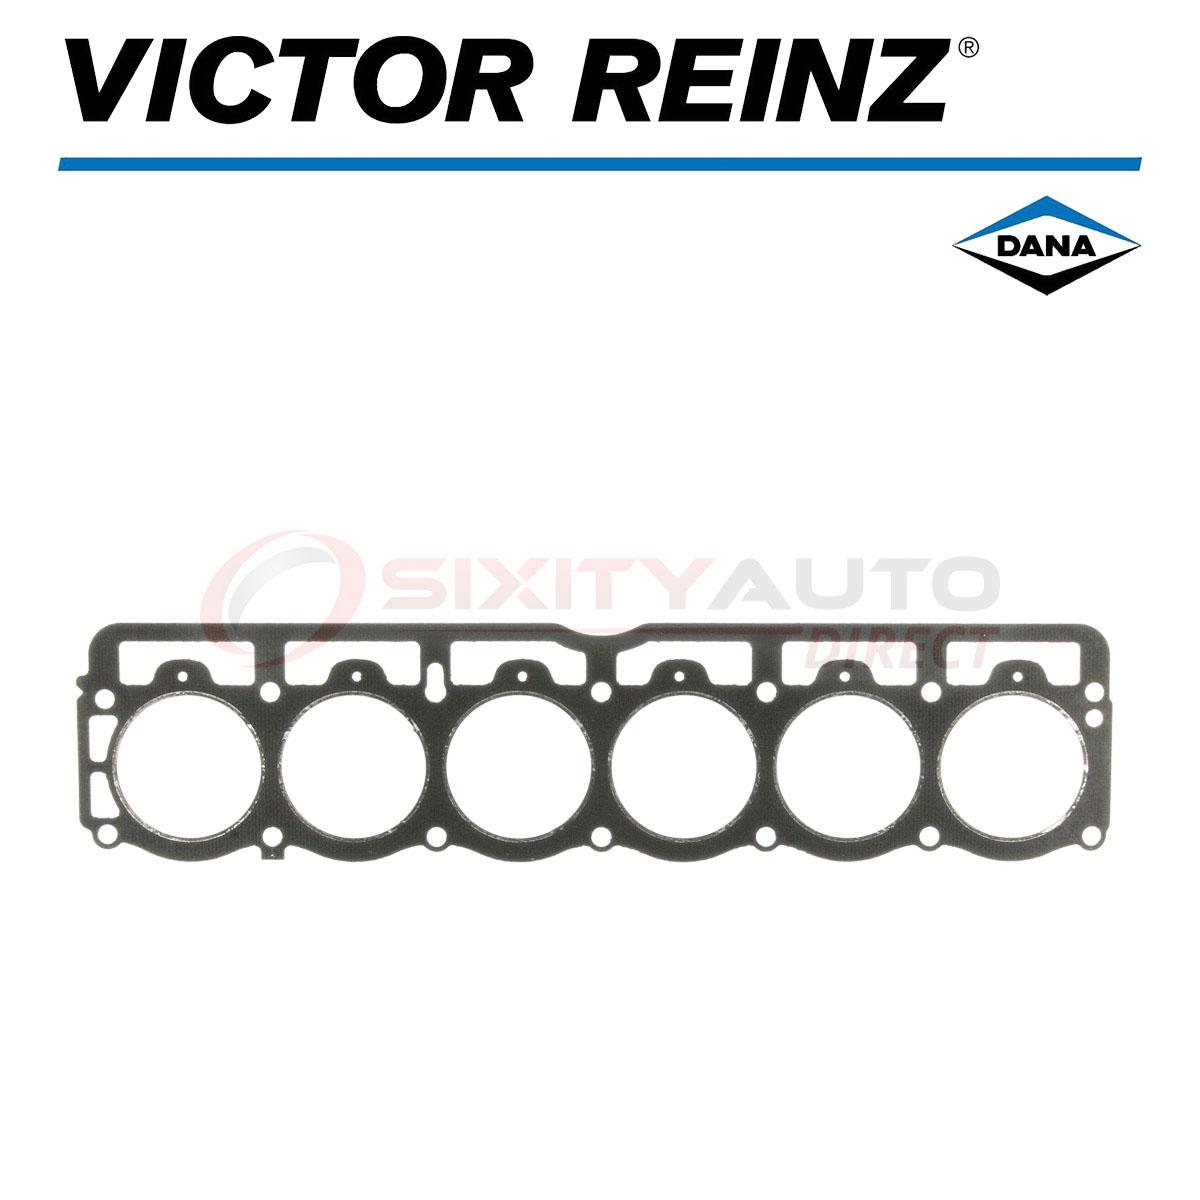 Victor Reinz Cylinder Head Gasket For Jeep Cj7 3